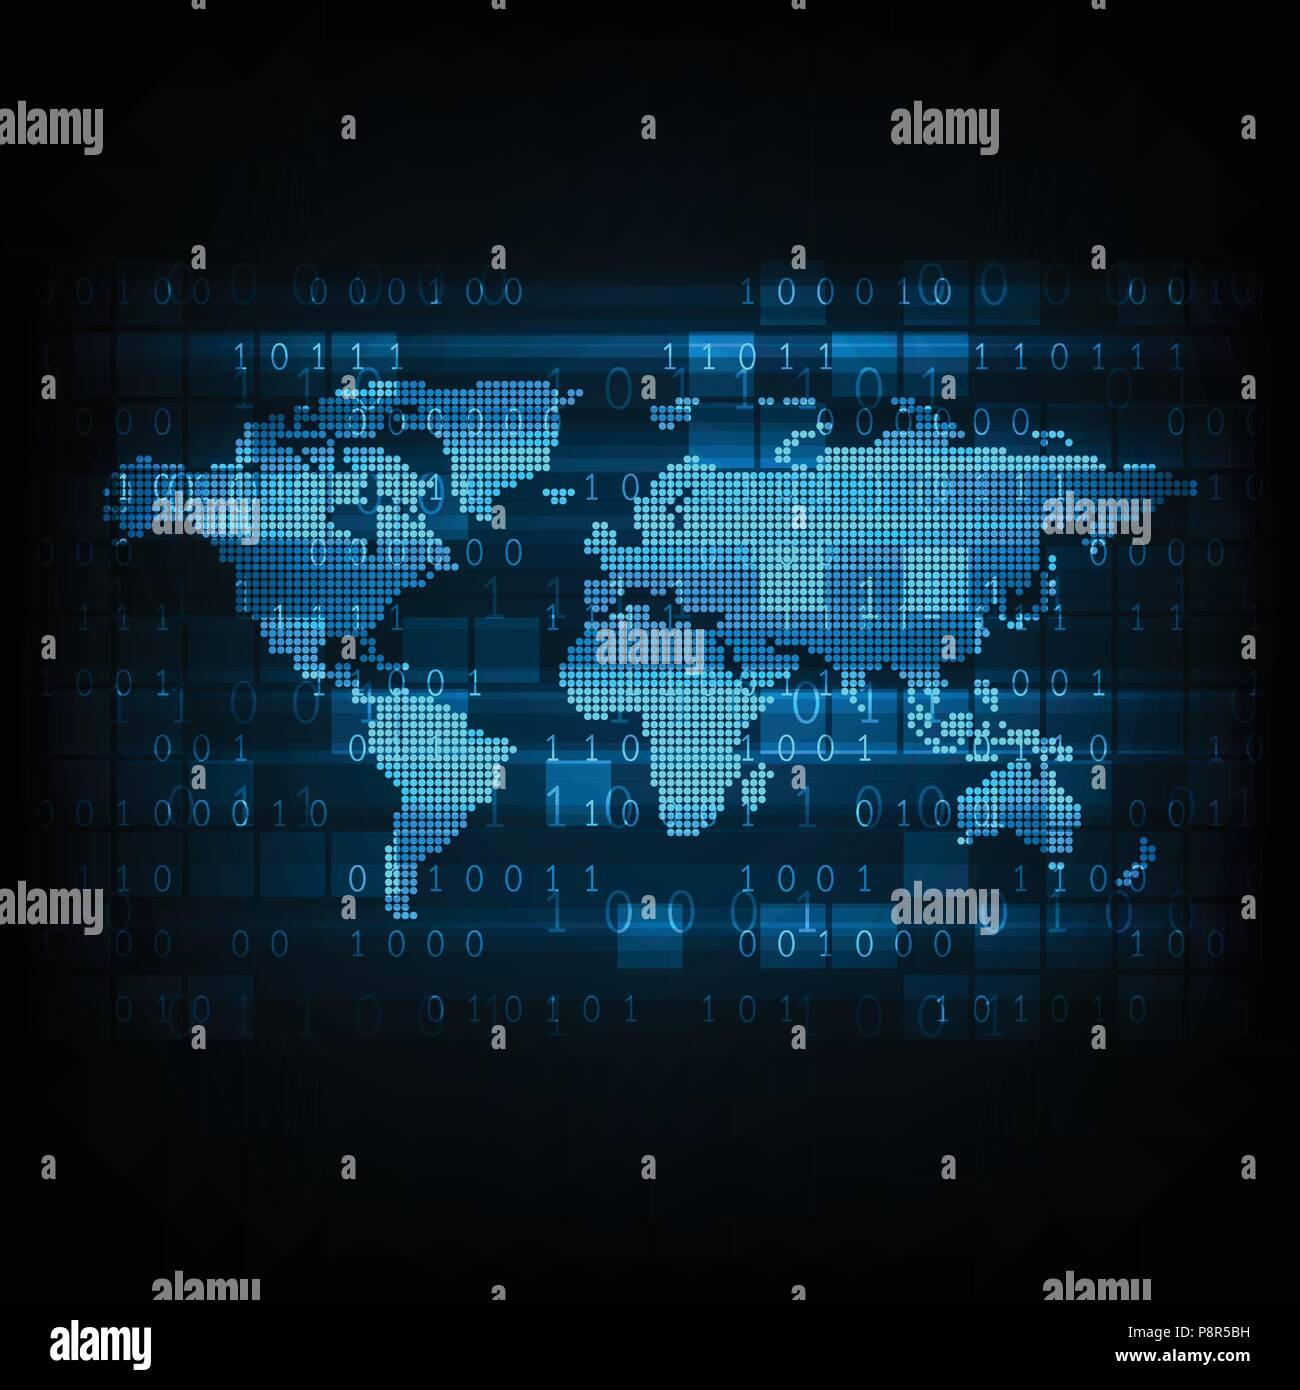 Vector Technology Digital World Map Stock Vector Art Illustration